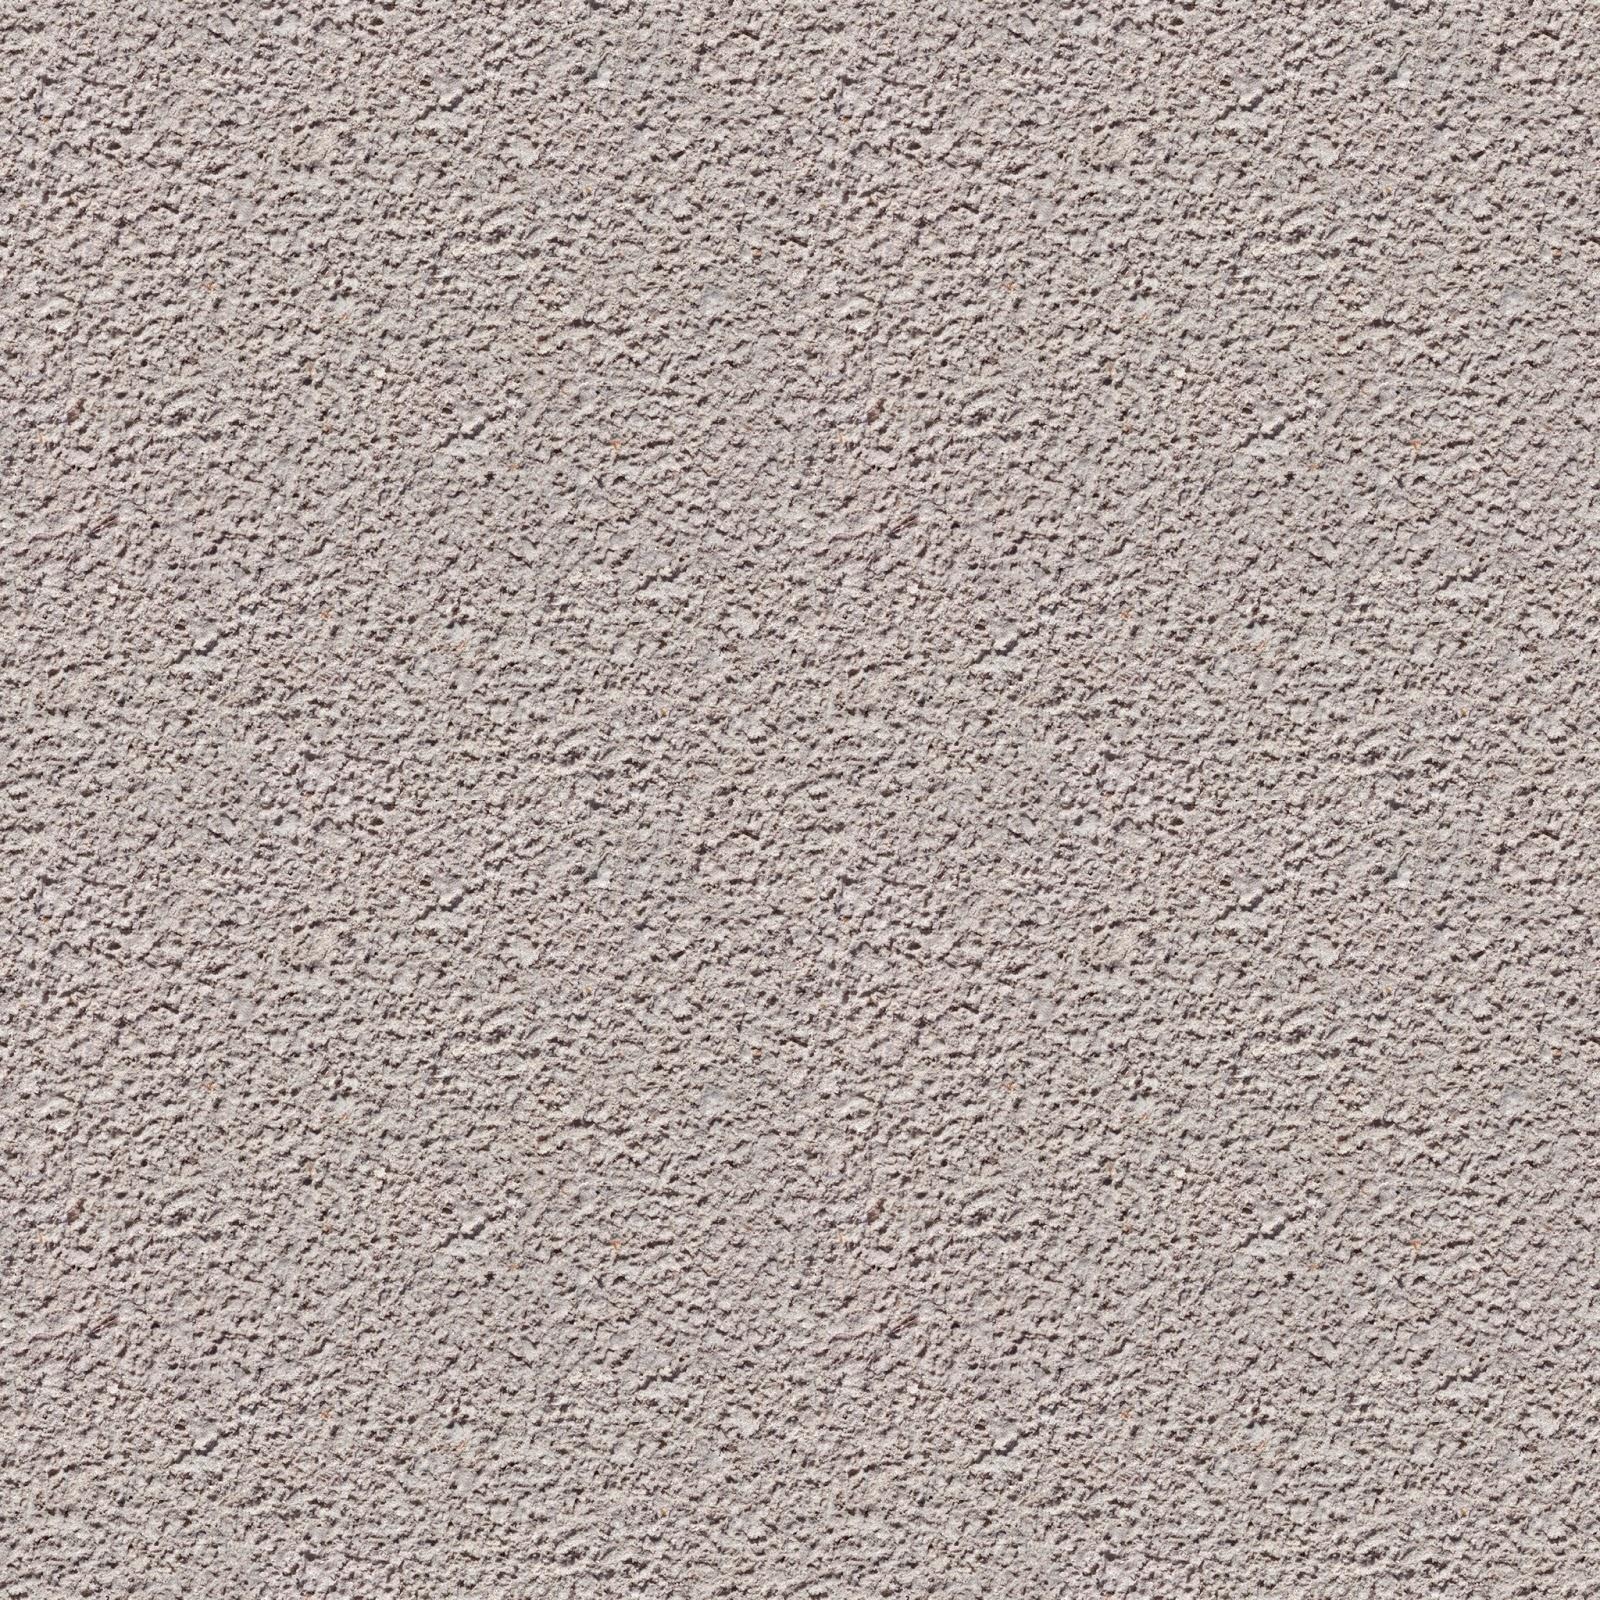 Seamless sand beach soil texture ver 2